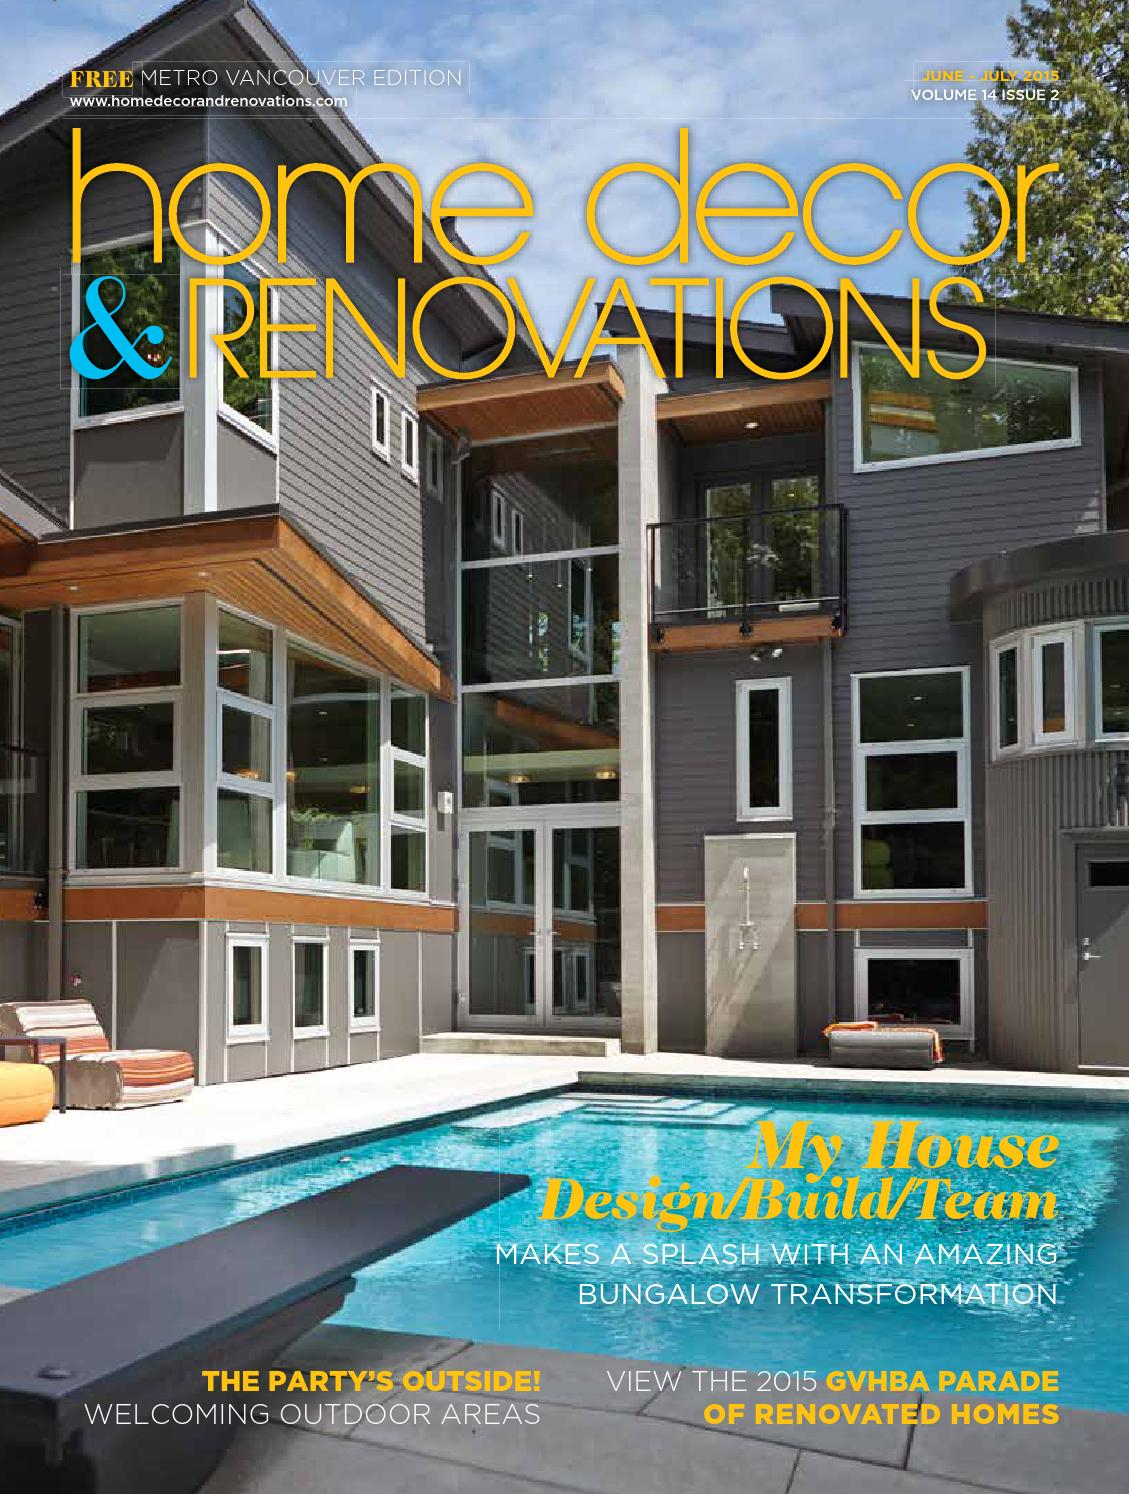 Vancouver Home DecorRenovationsJunJuly 2015 by YP NextHome